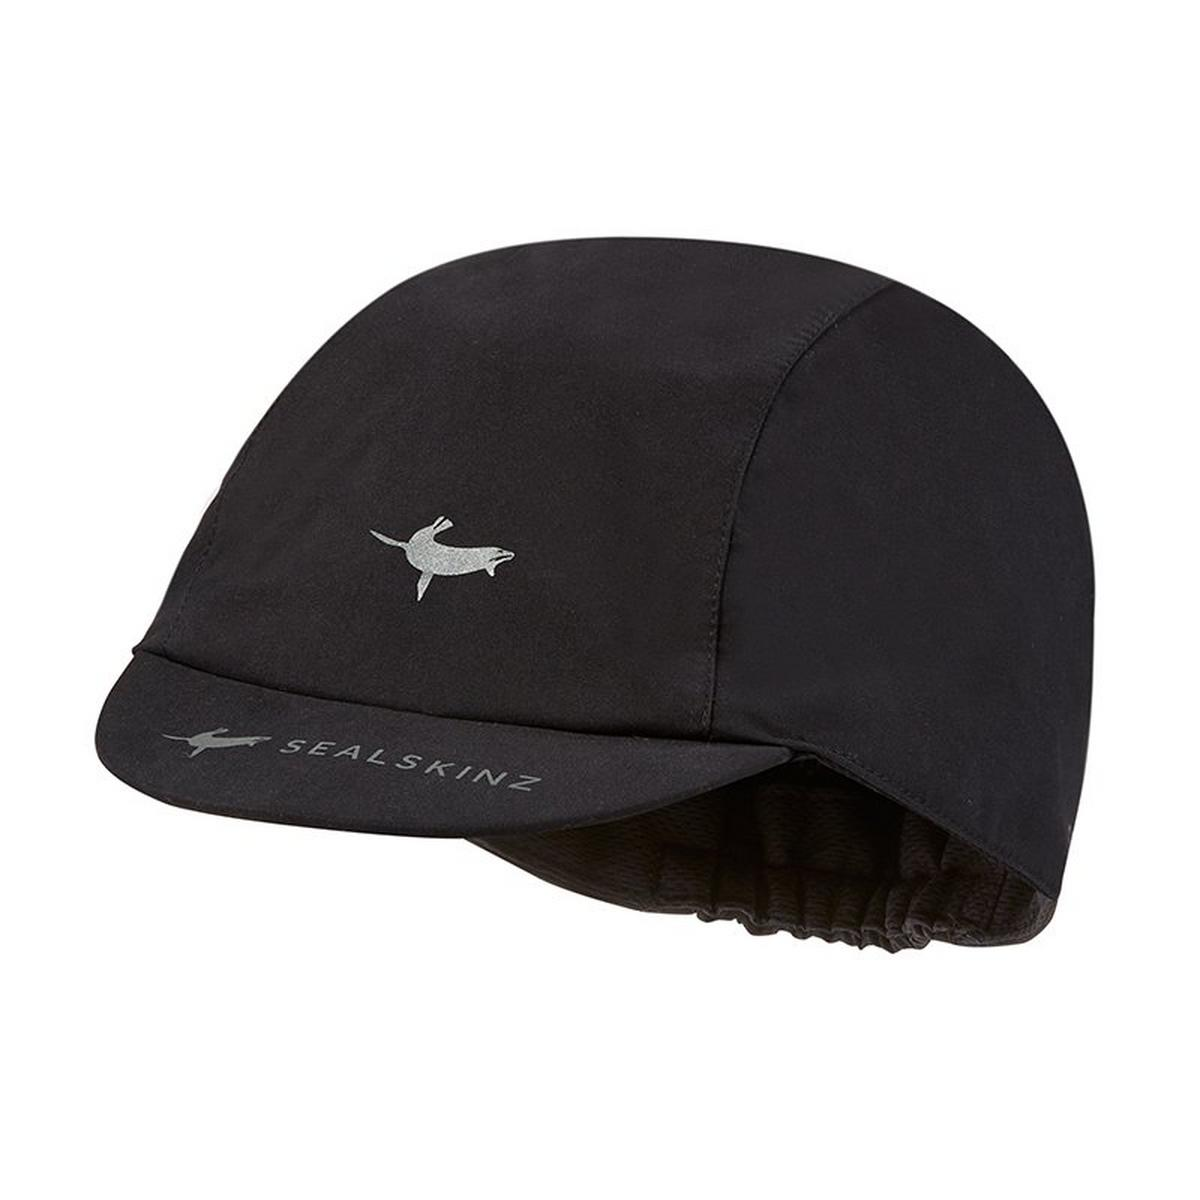 Sealskinz Waterproof Cycling Cap